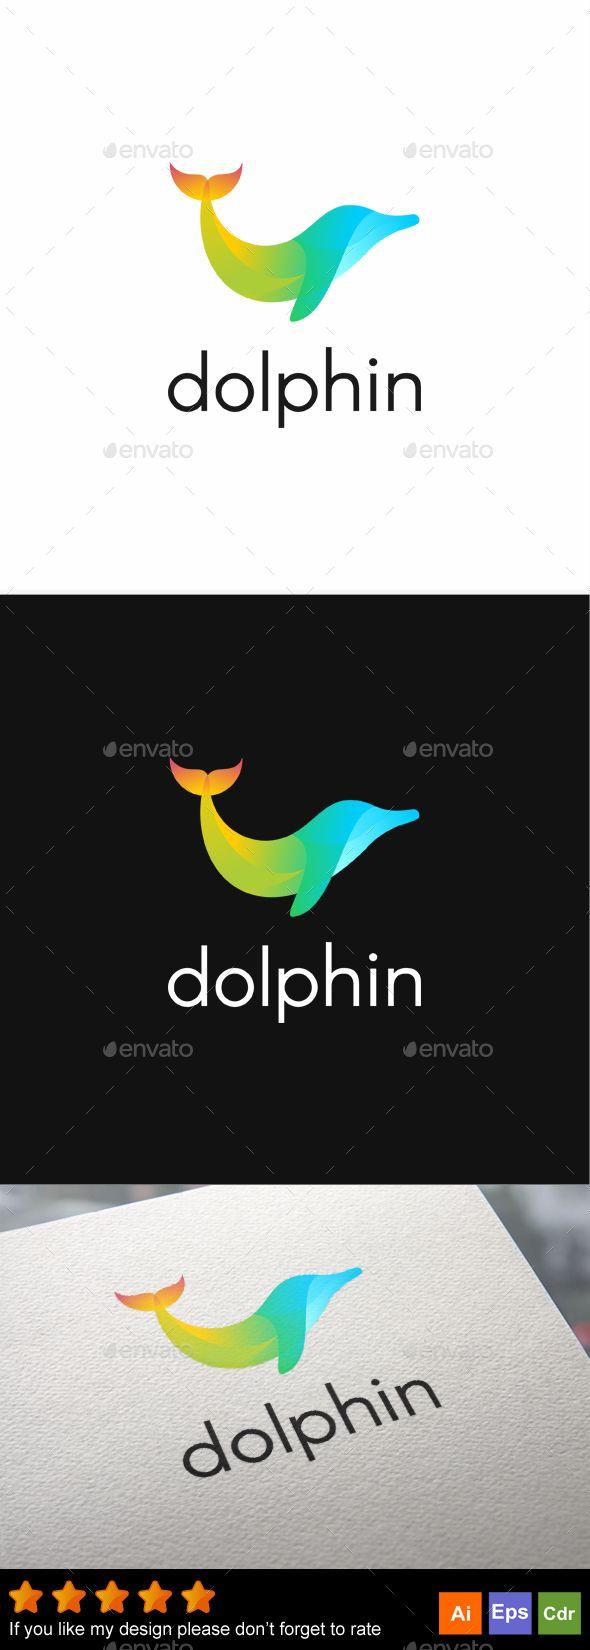 Dolphin | Pinterest | Coreldraw, Ai illustrator and Logo templates